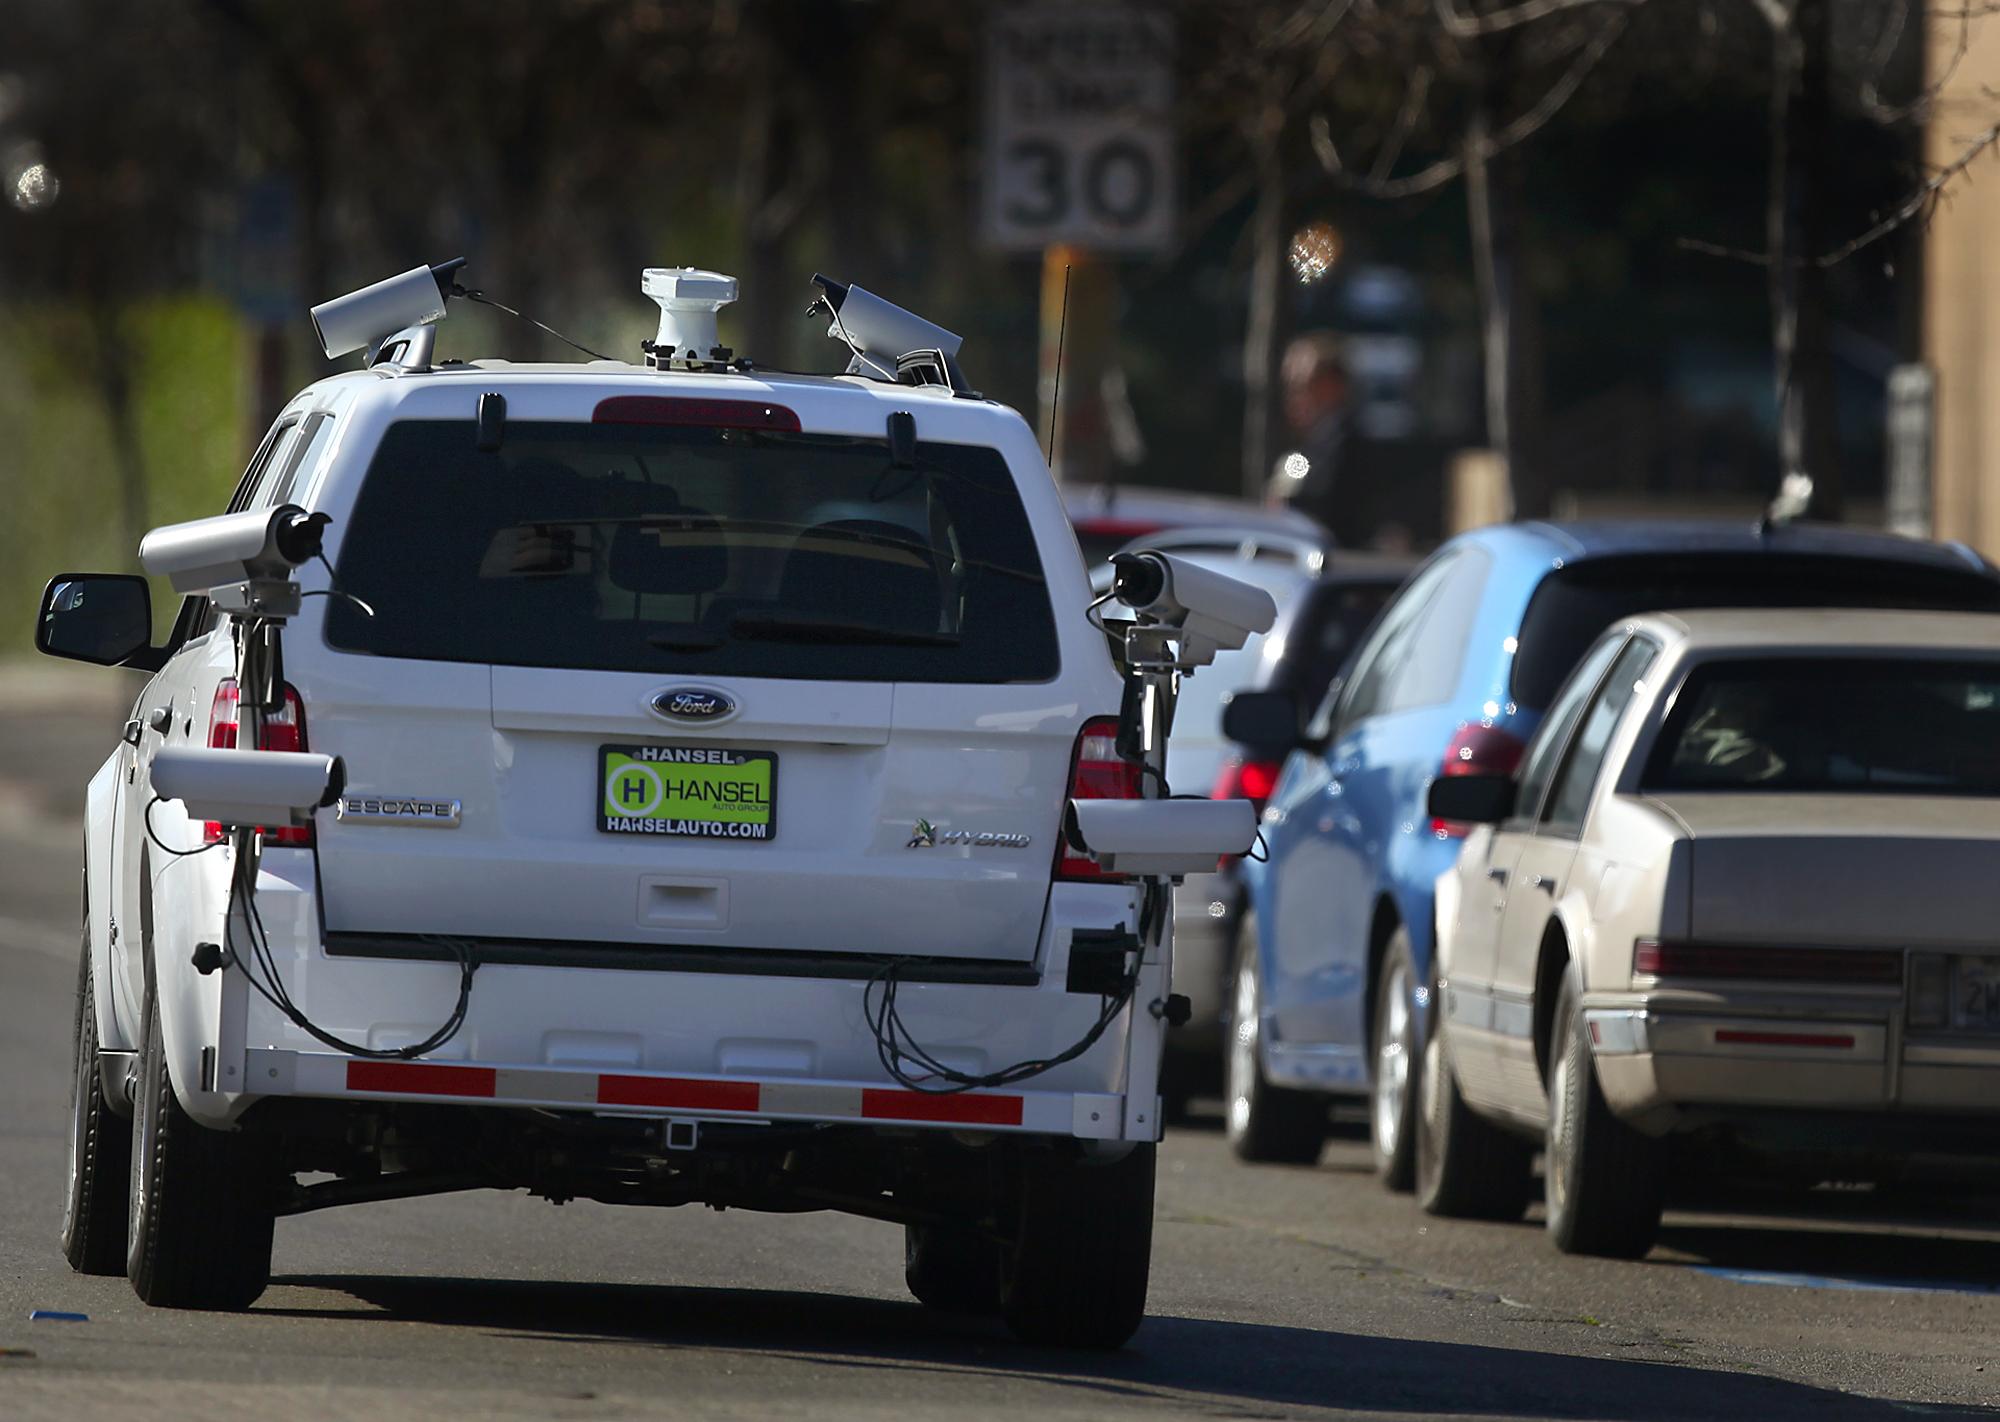 Mailbag Santa Rosa S Parking Surveillance Suv Travel Time Signs